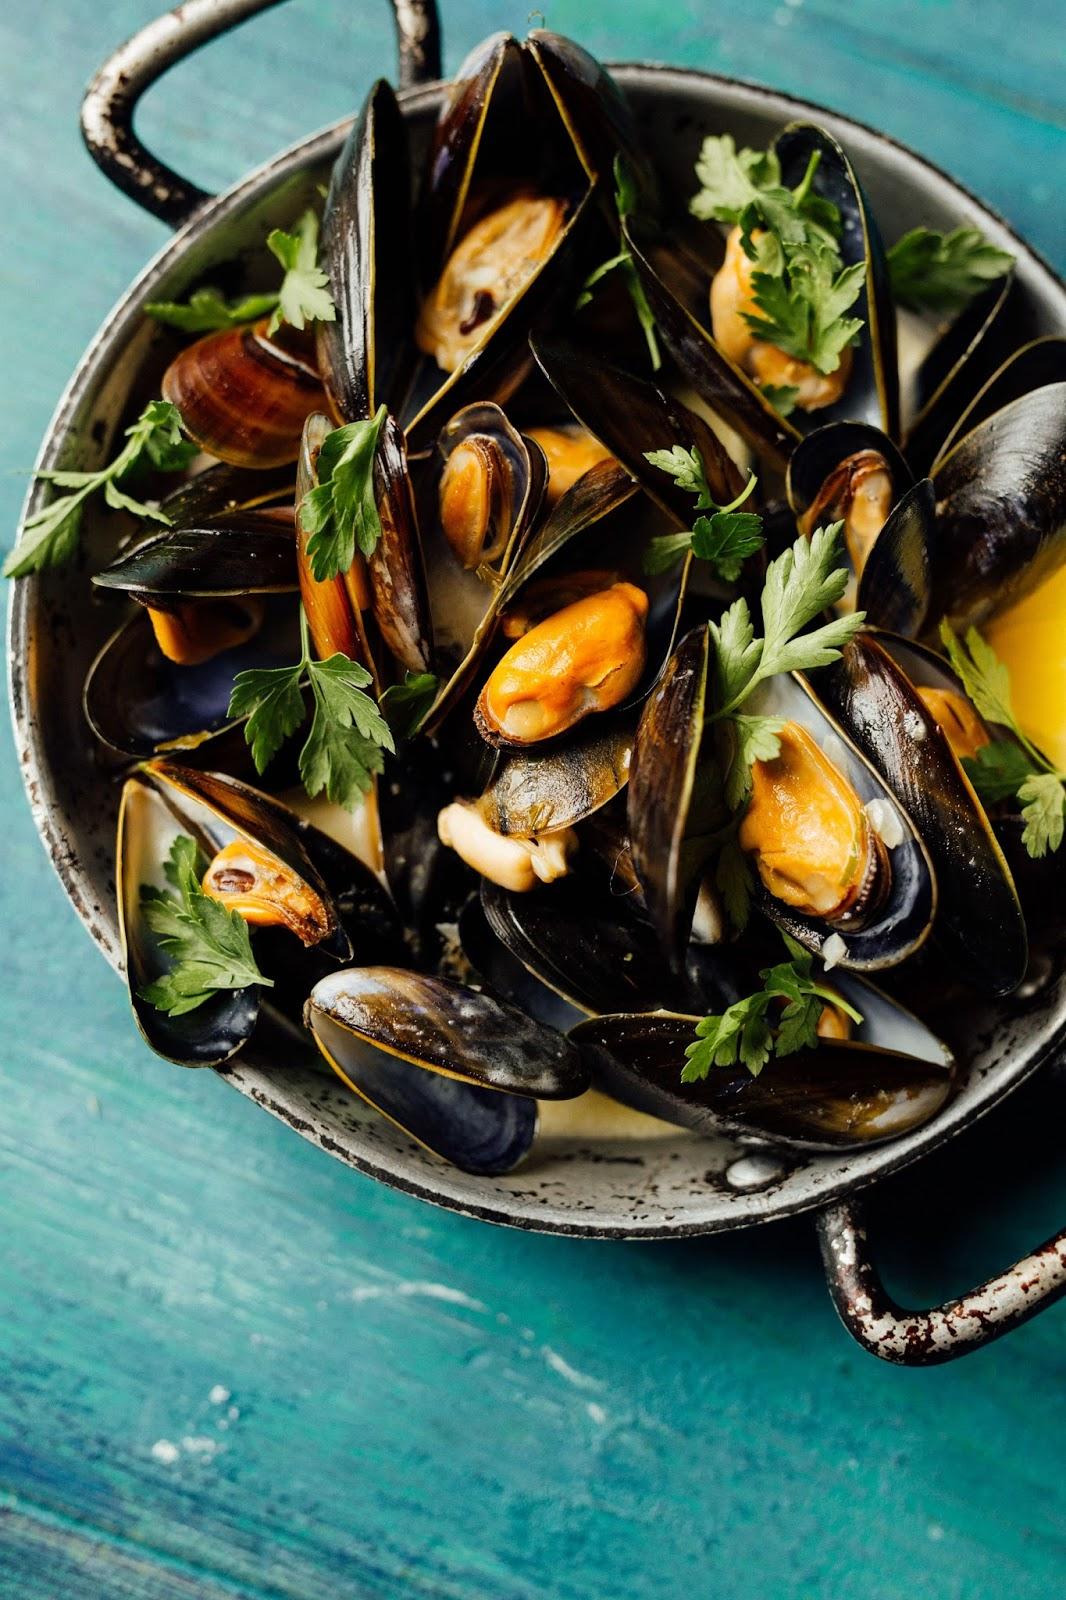 How To Make Bill's Restaurants Speedy Mussels With Cider Cream